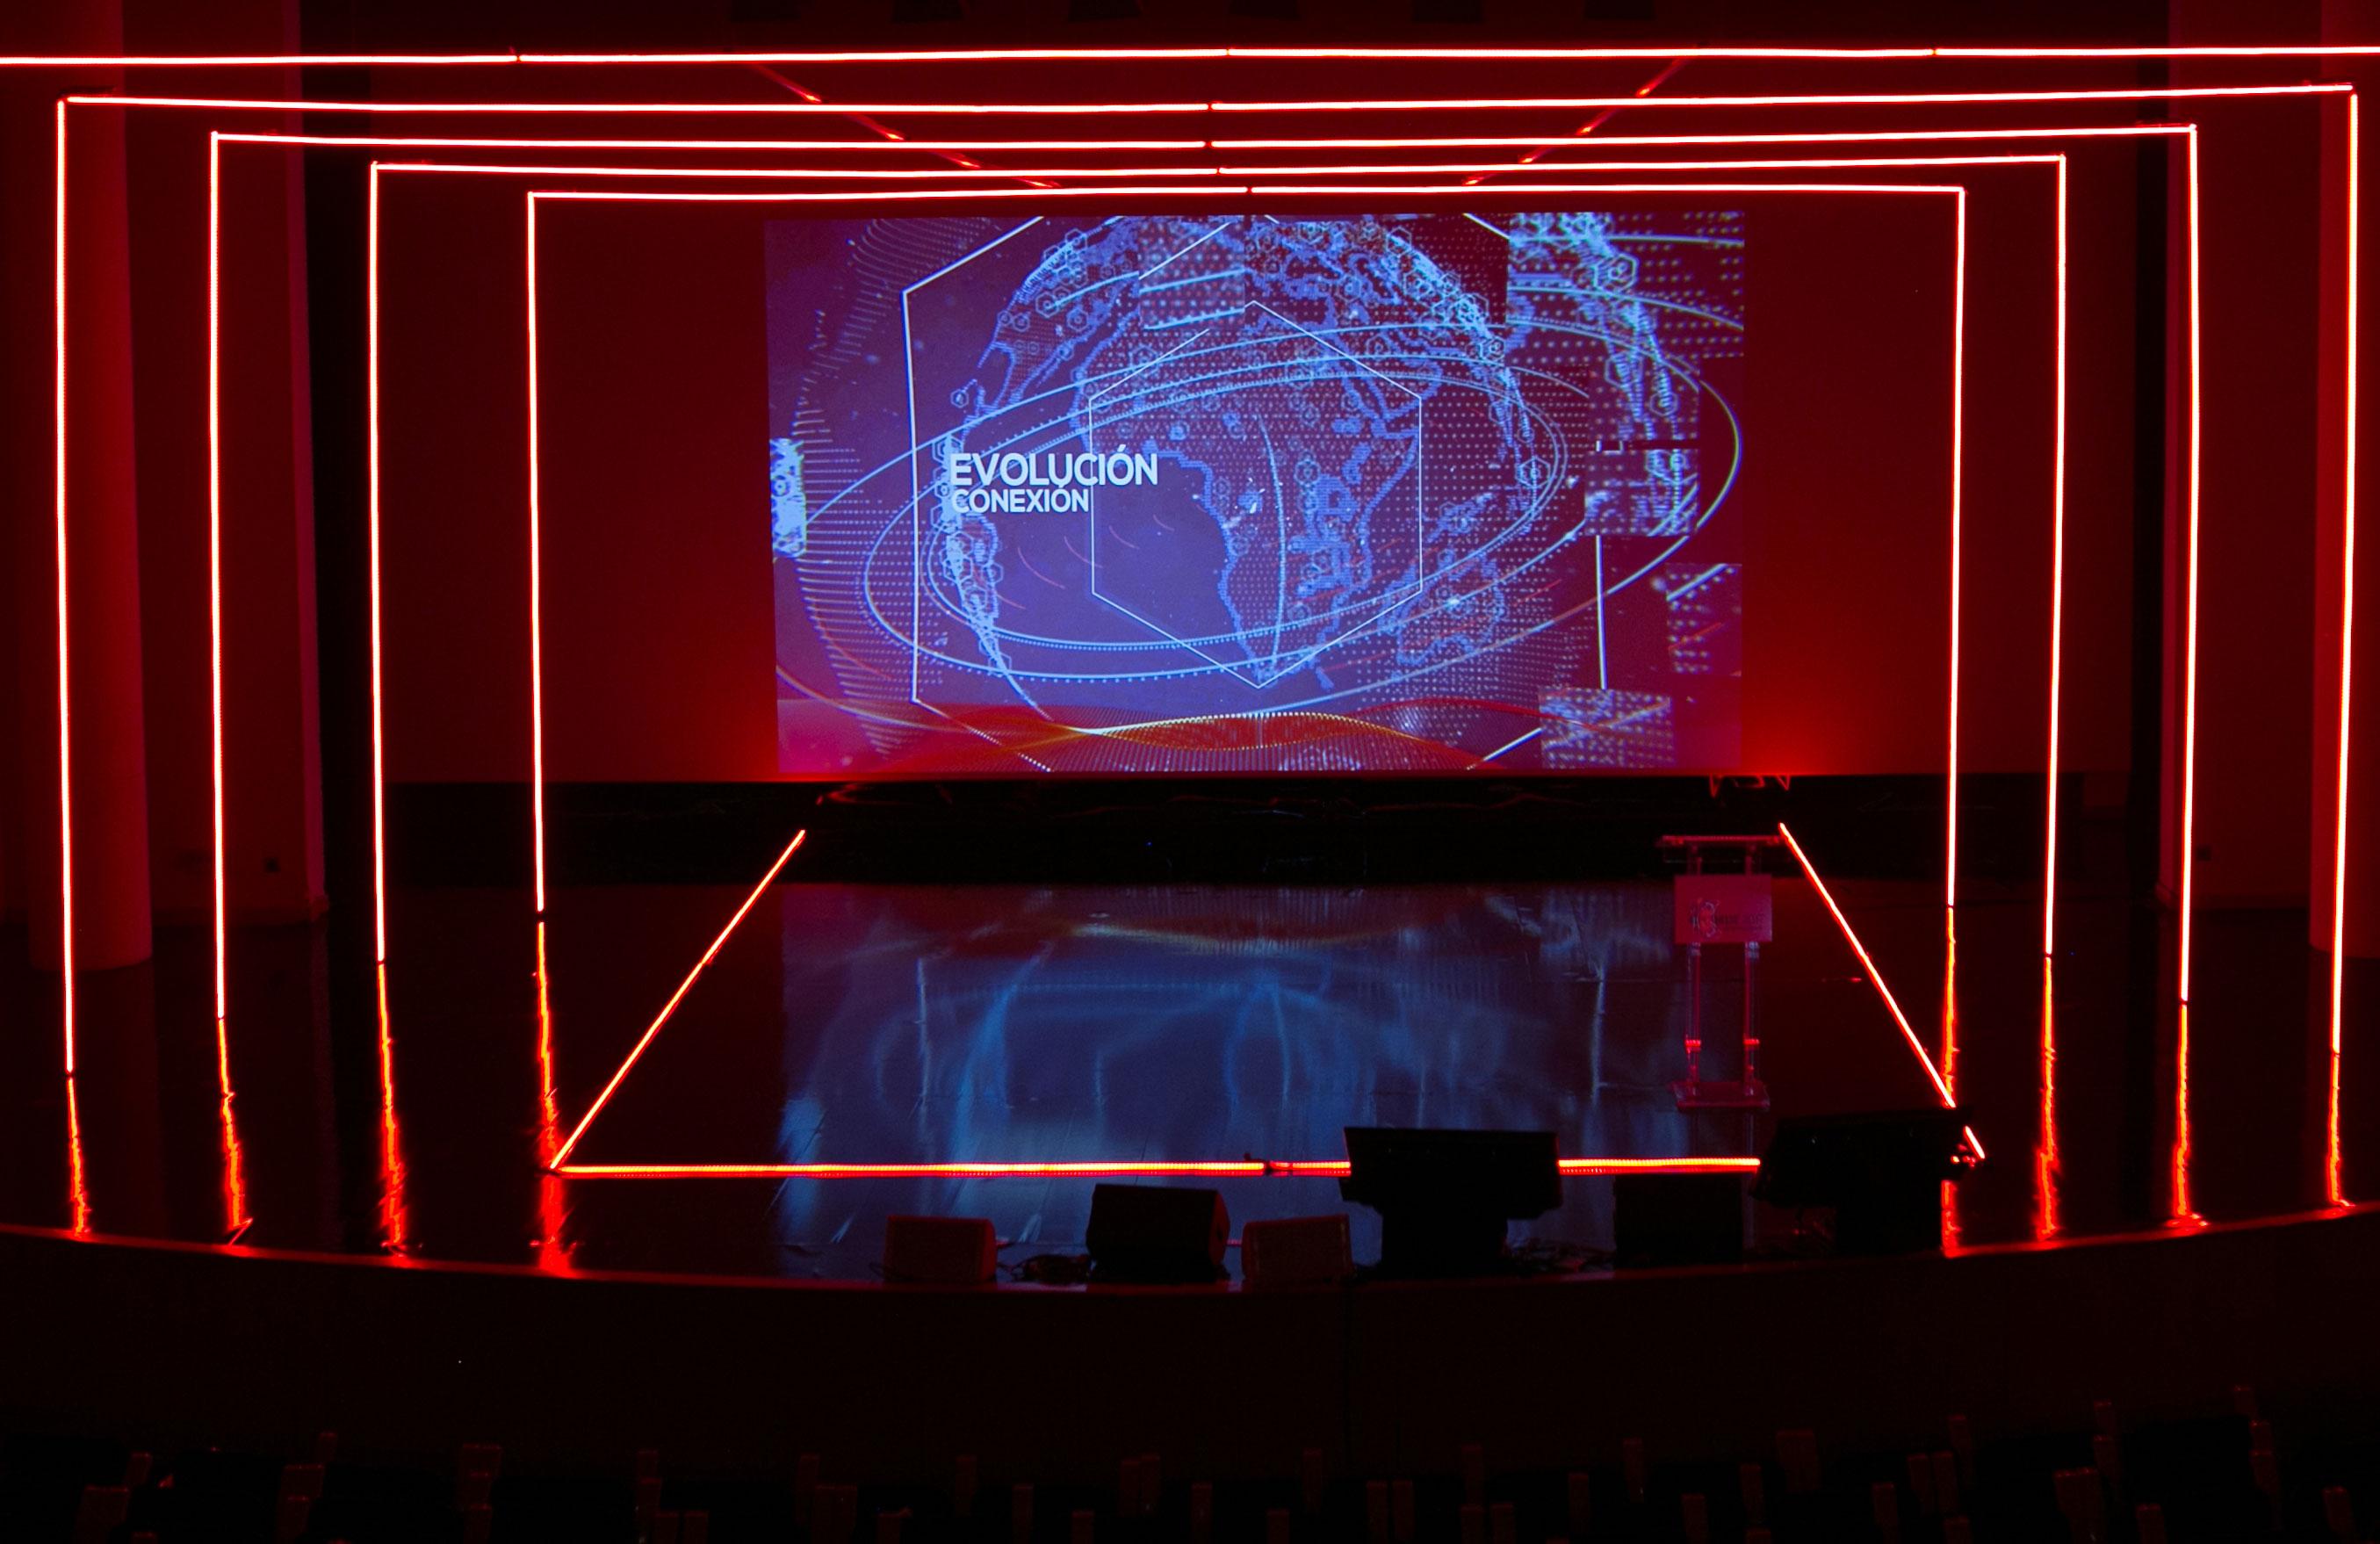 visuales, video, storytelling audiovisual, evento, volando vengo